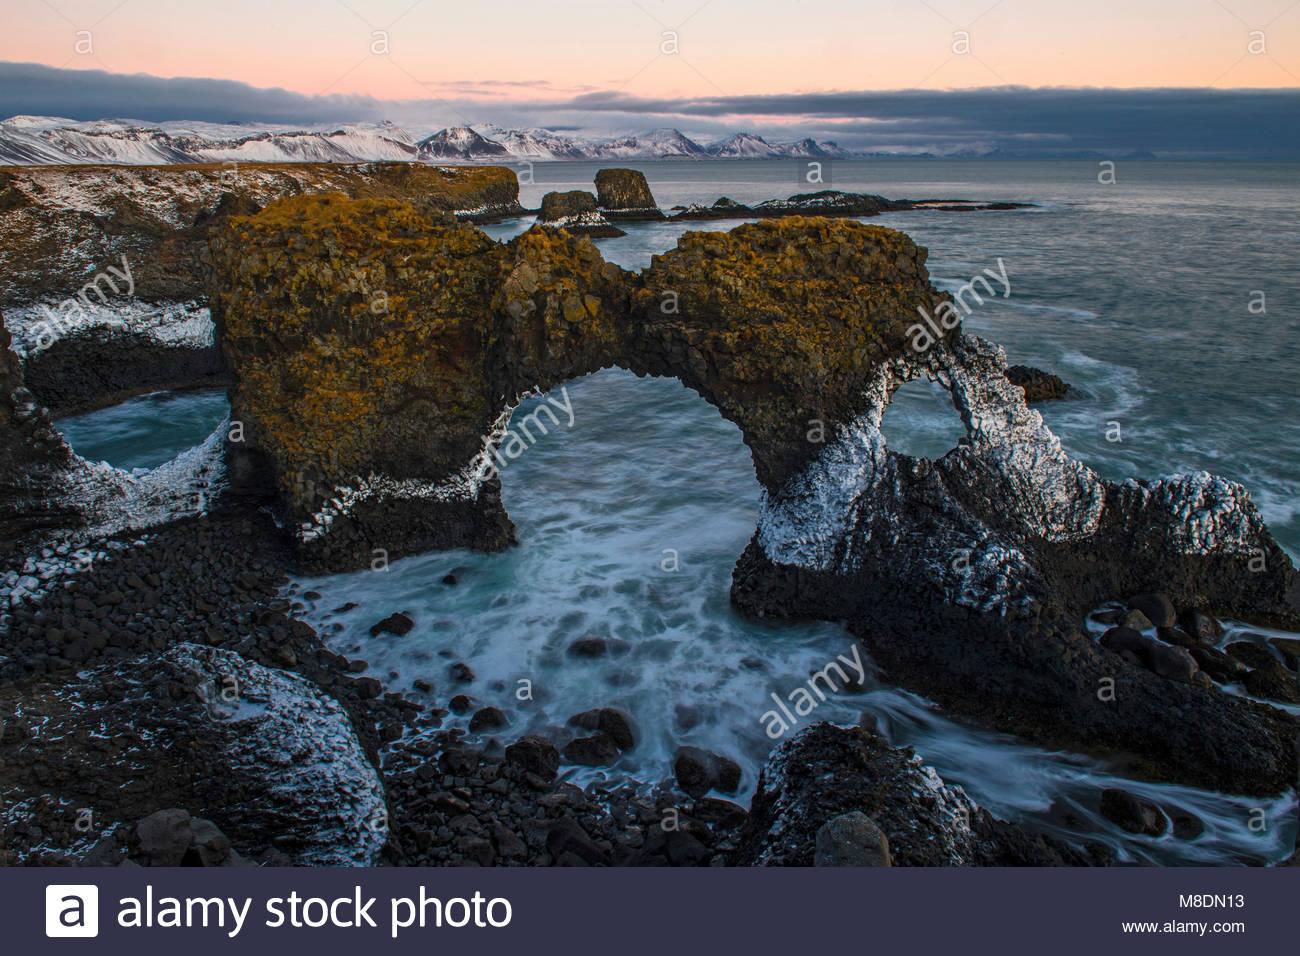 Basalt coast, Arnastapi, Snaefellsnes Peninsula, Iceland - Stock Image